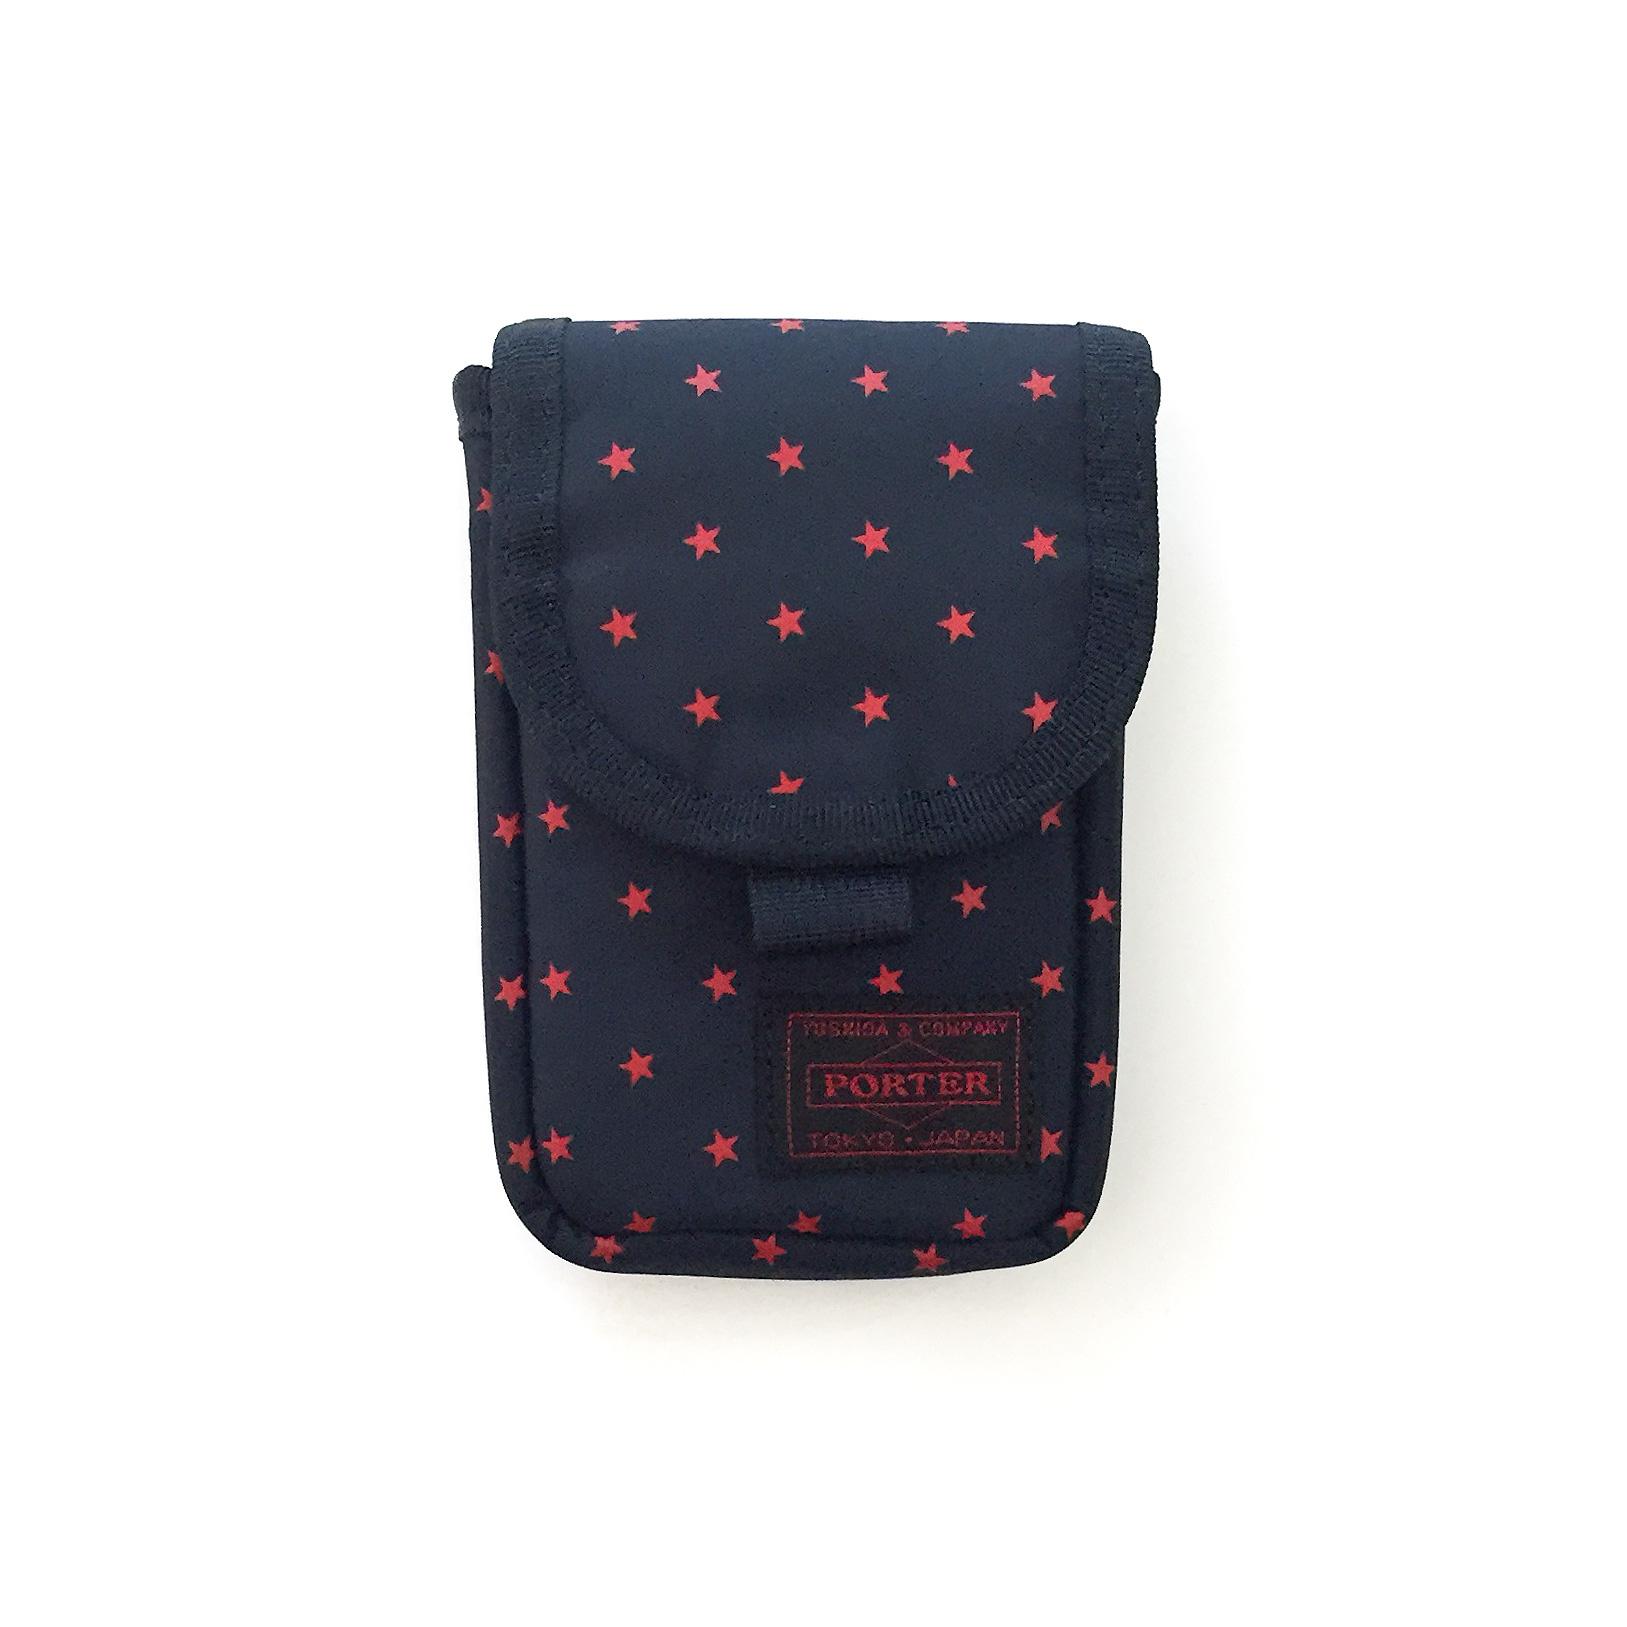 6584857b8b5c Head Porter Stellar iPod Case Navy Size one size - Bags   Luggage ...